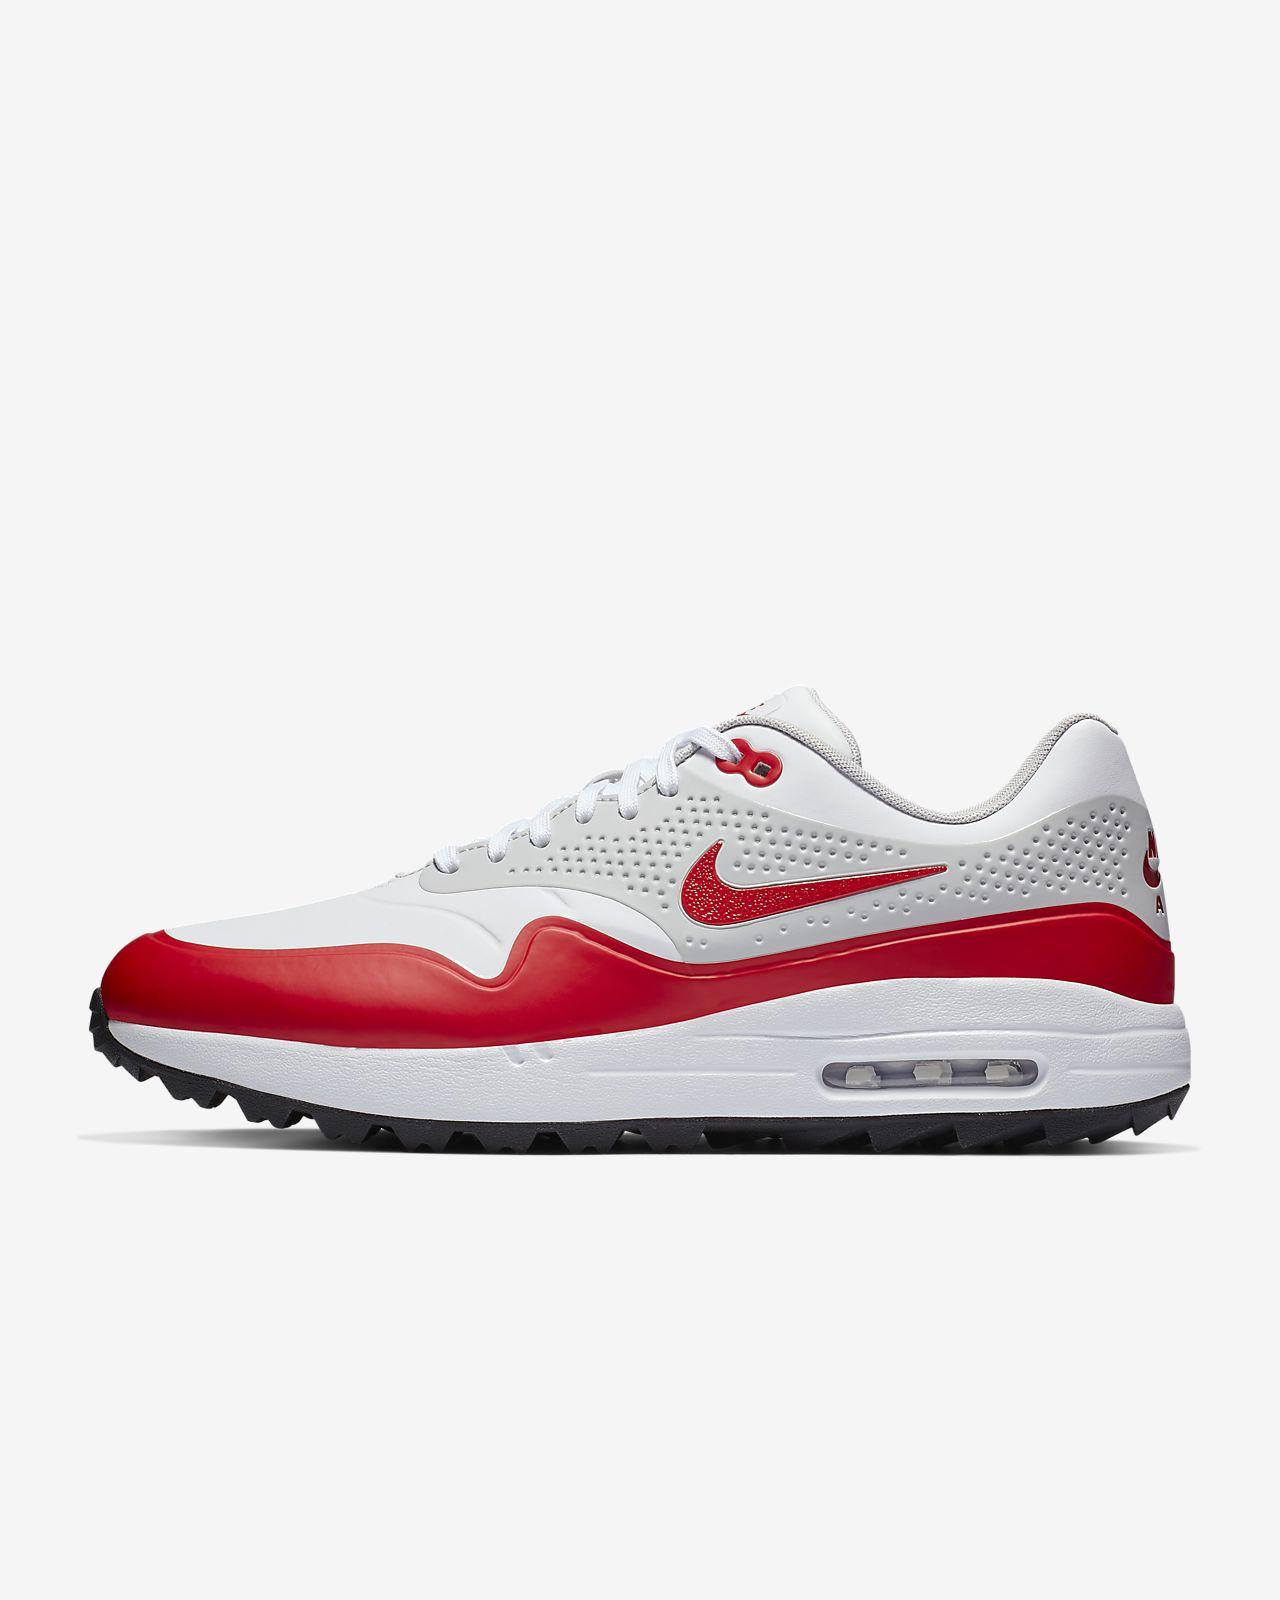 new styles 88e97 55903 ... Męskie buty do golfa Nike Air Max 1 G